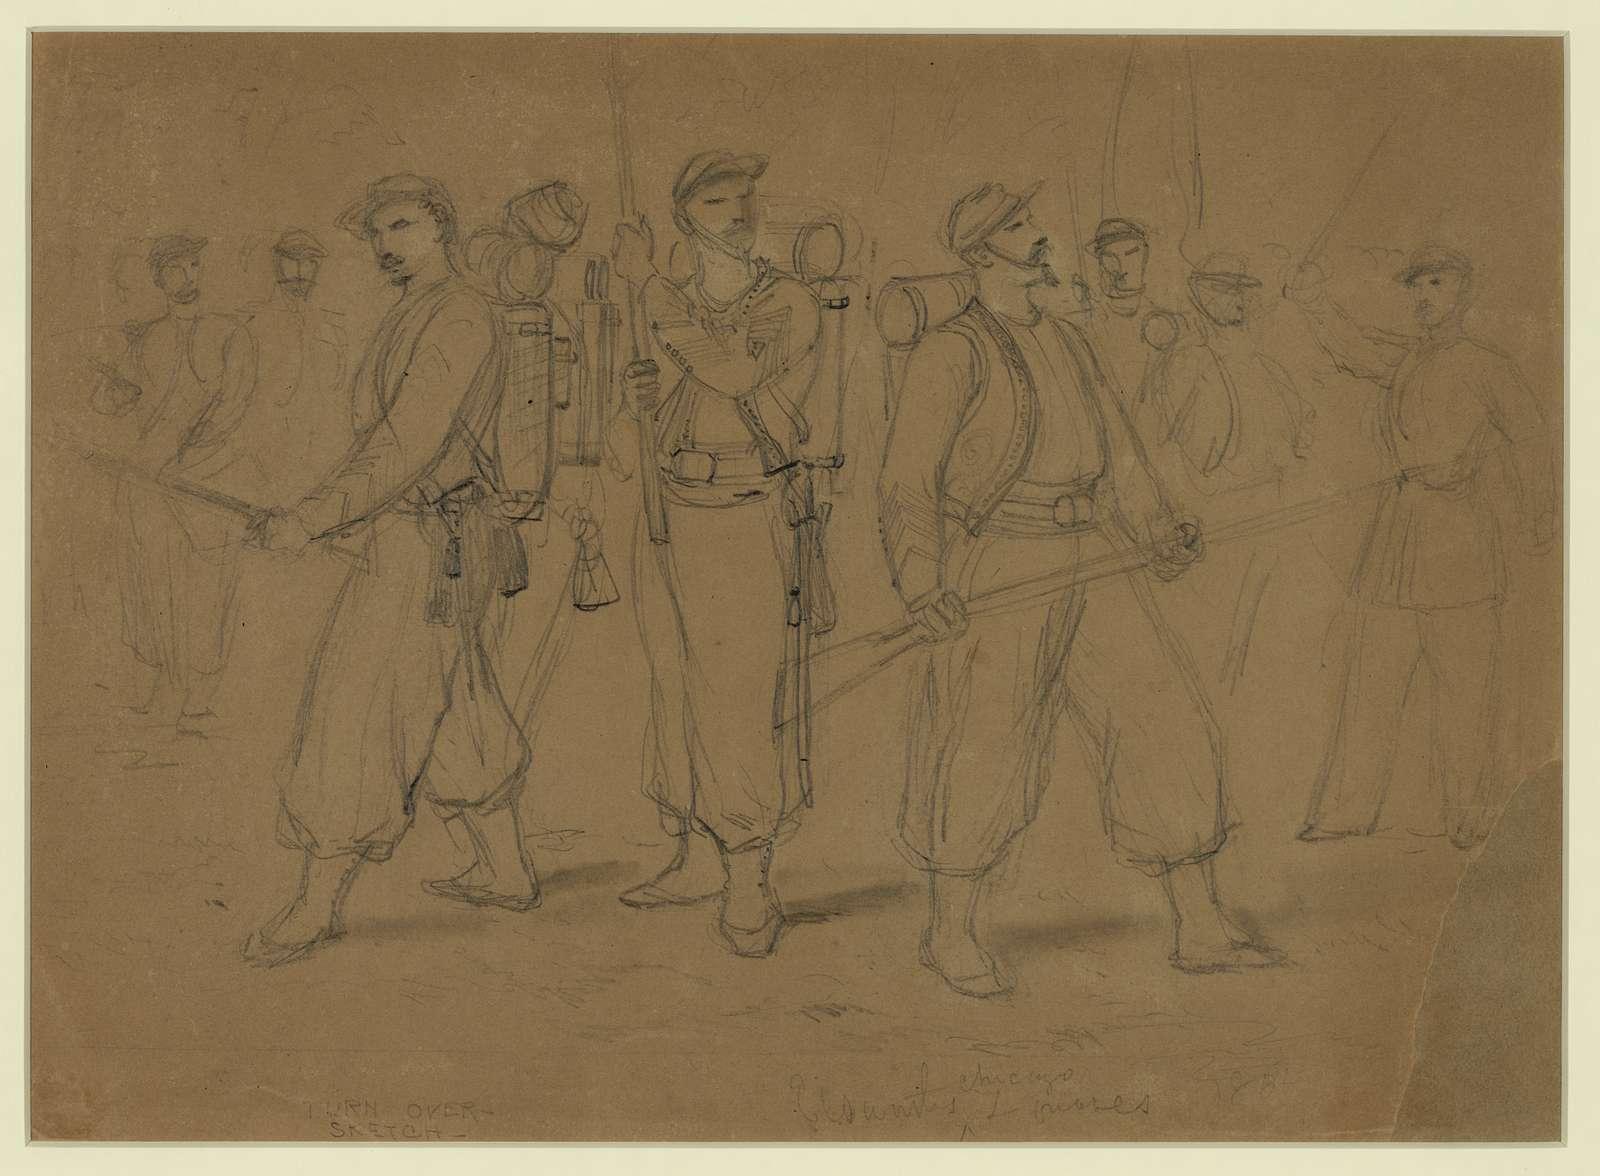 Elsworths [sic] Chicago Zouaves, 1861